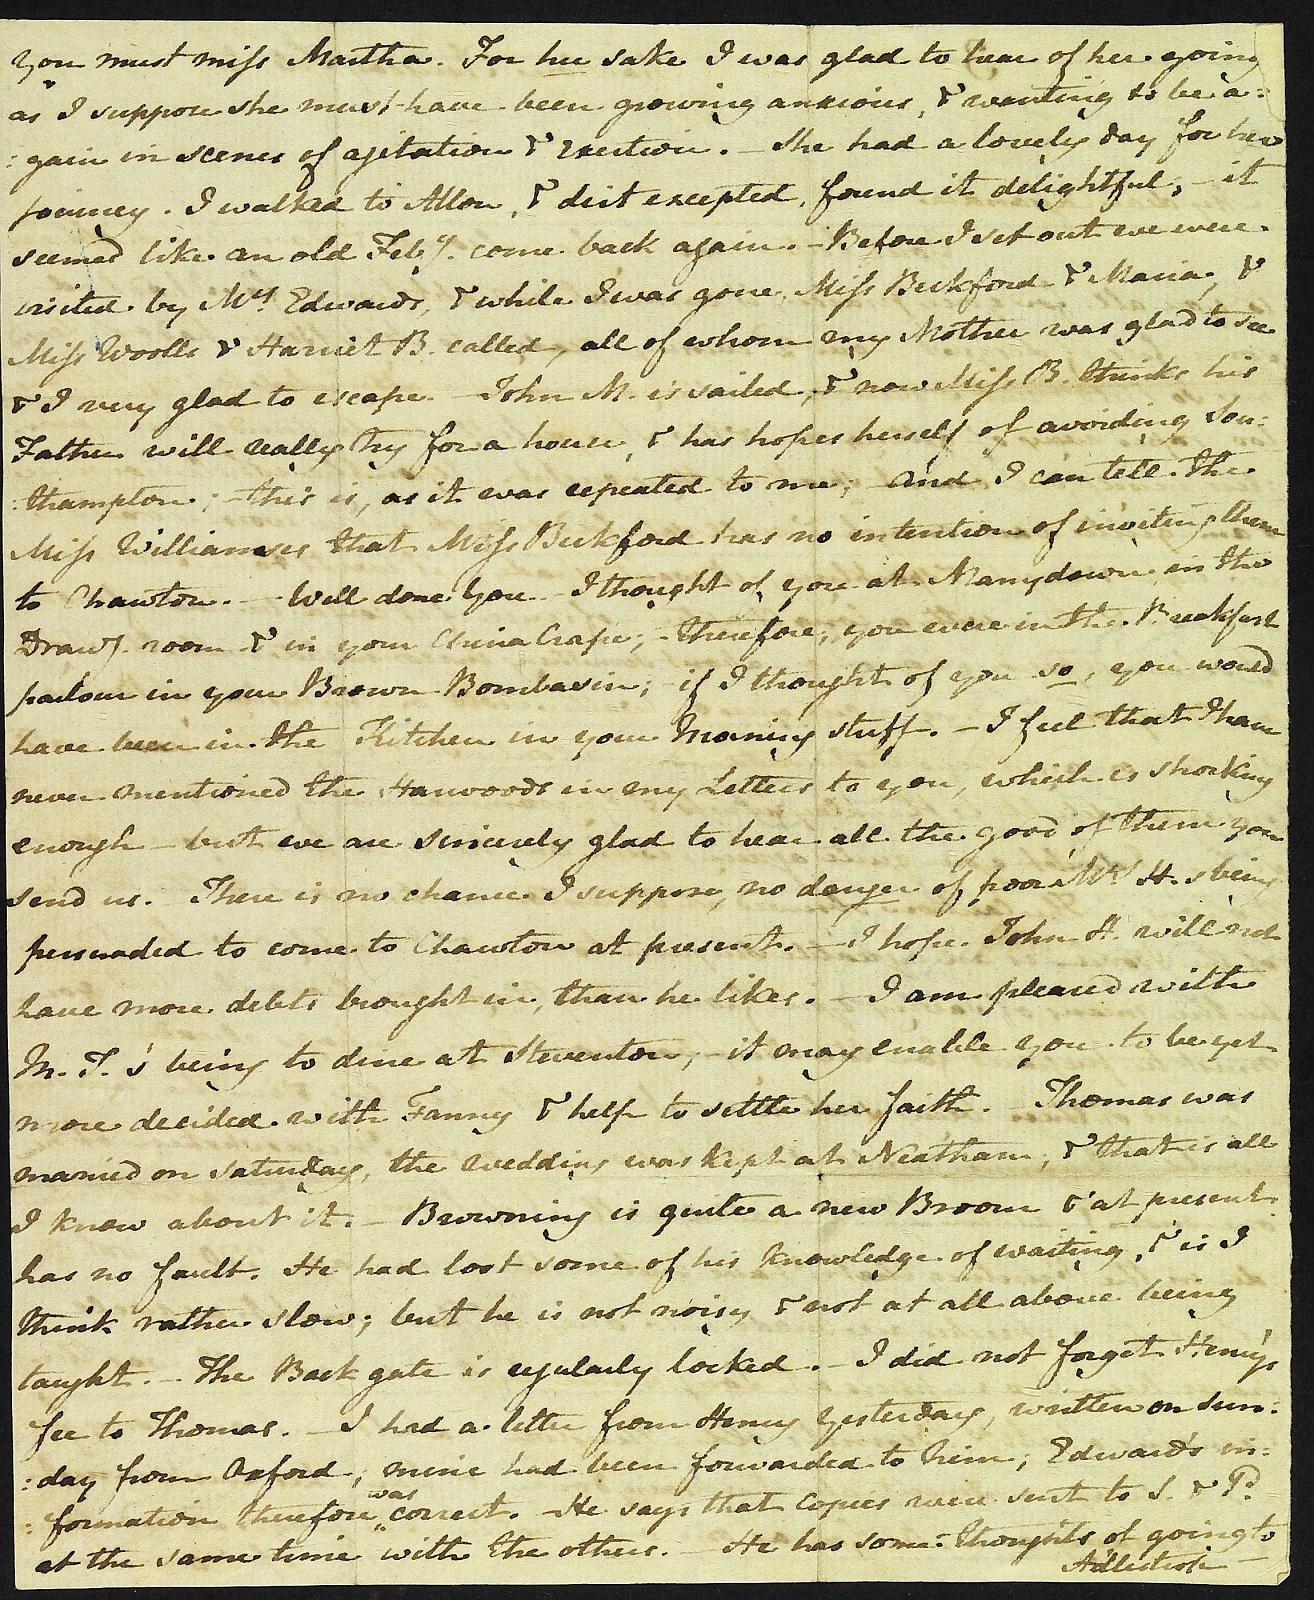 Letter from Jane Austen to Cassandra Austen, 4 February 1813. Page 2